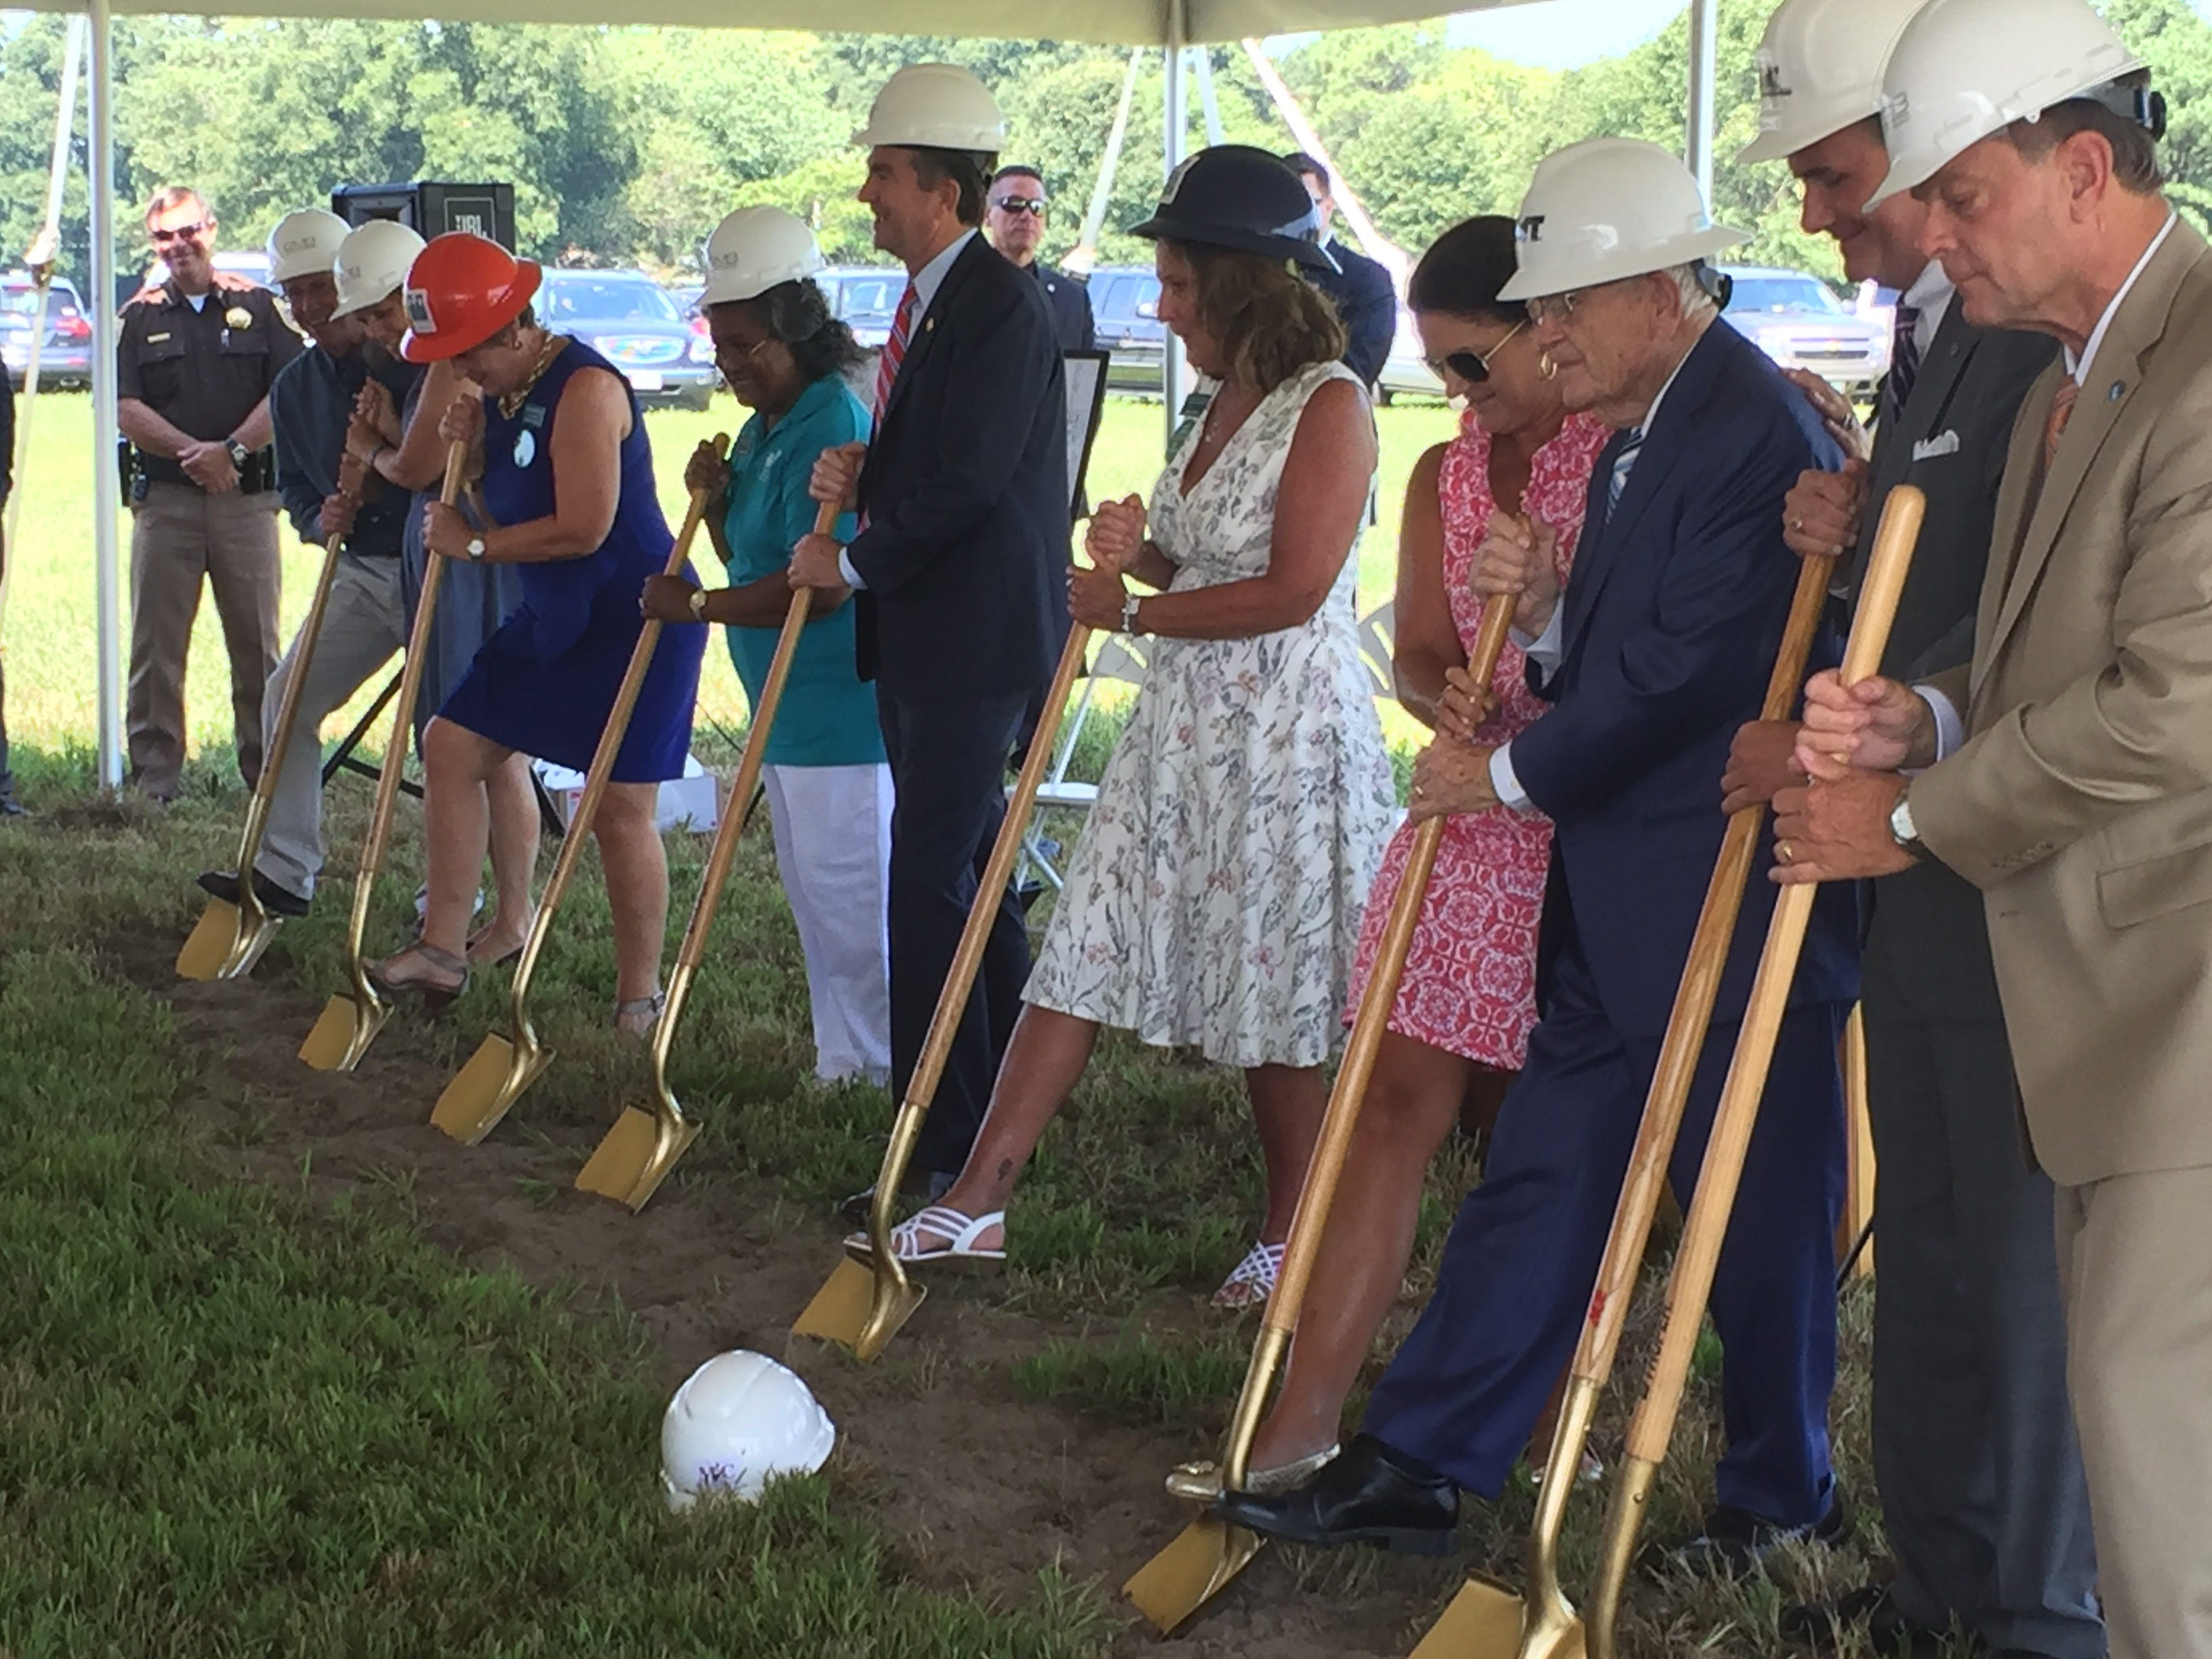 Officials break ground on Eastville Community Health Center during a ceremony in Eastville, Virginia on Wednesday, Aug. 15, 2018.